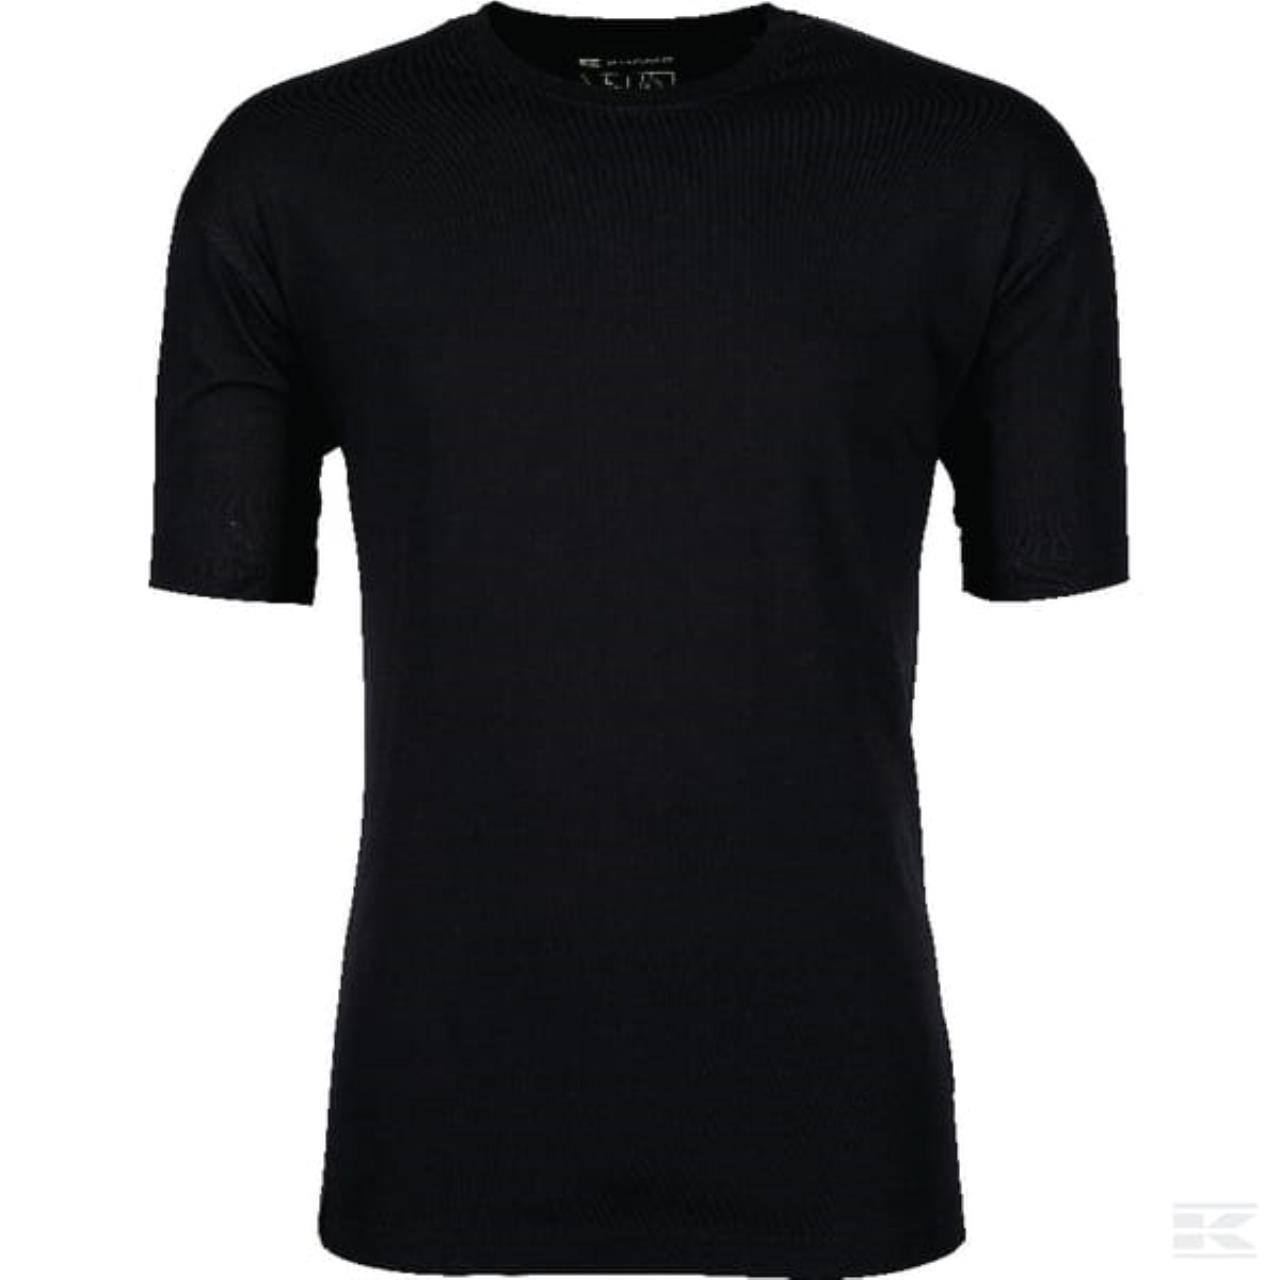 T-shirt Original sort